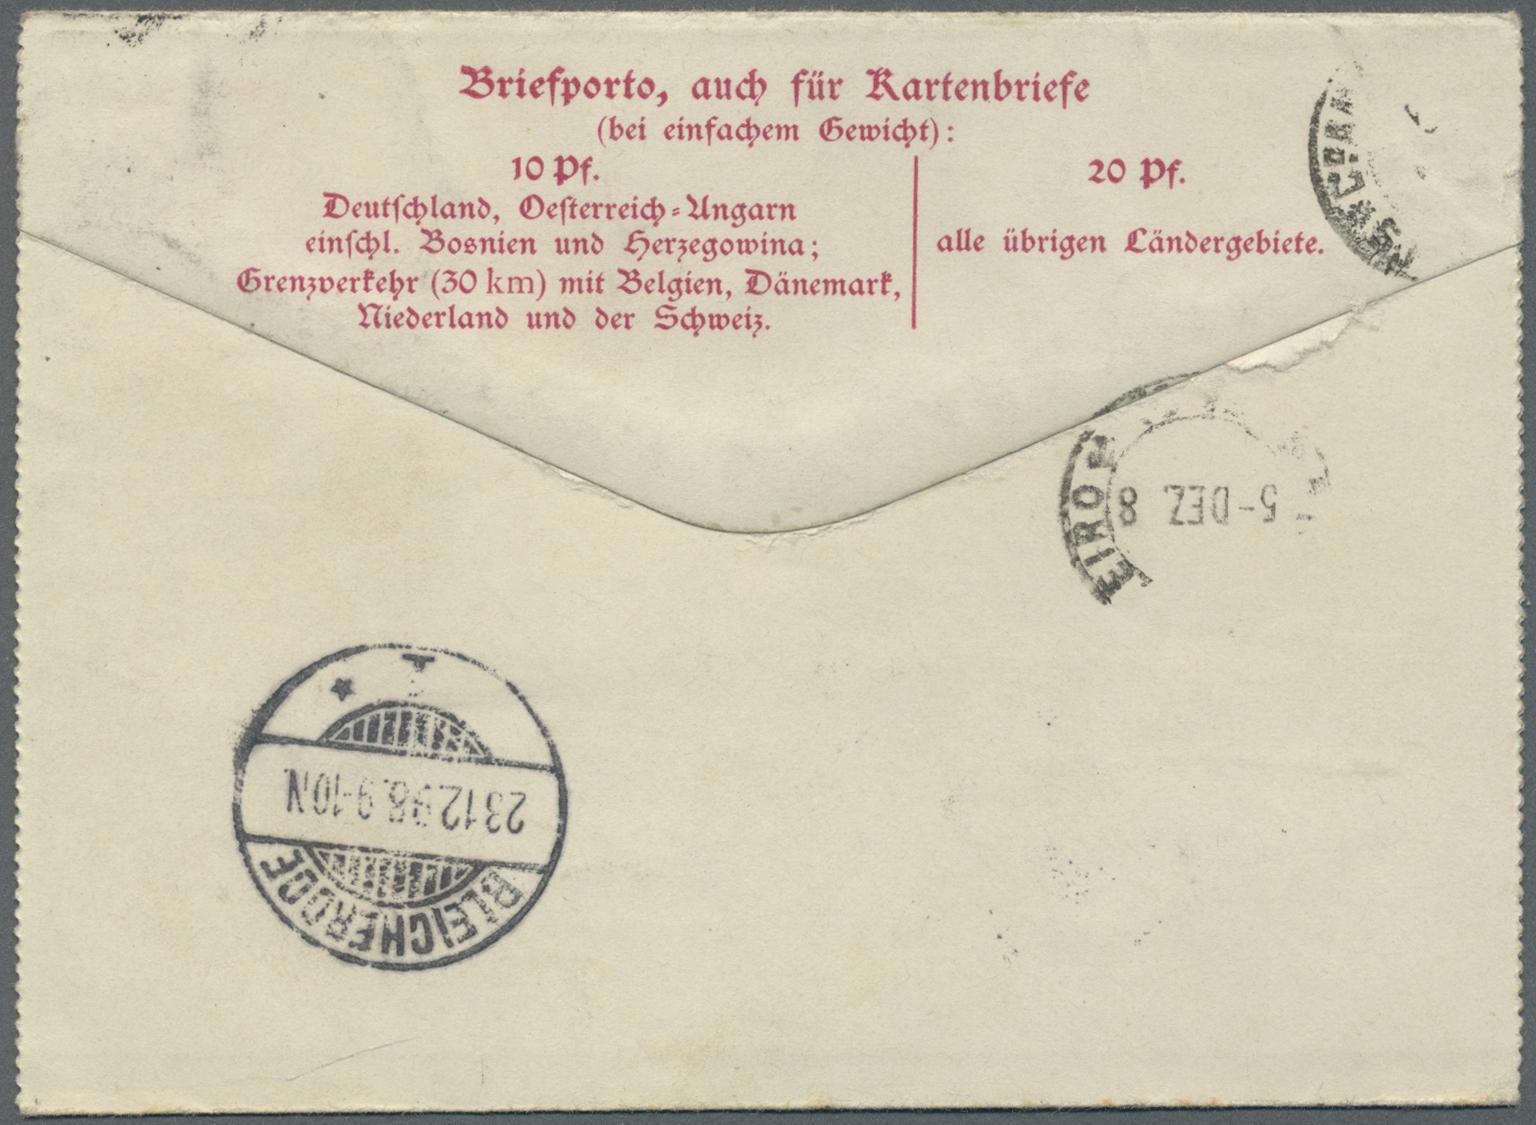 Stamp Auction Brasilien Single Lots Philately Overseas Europe